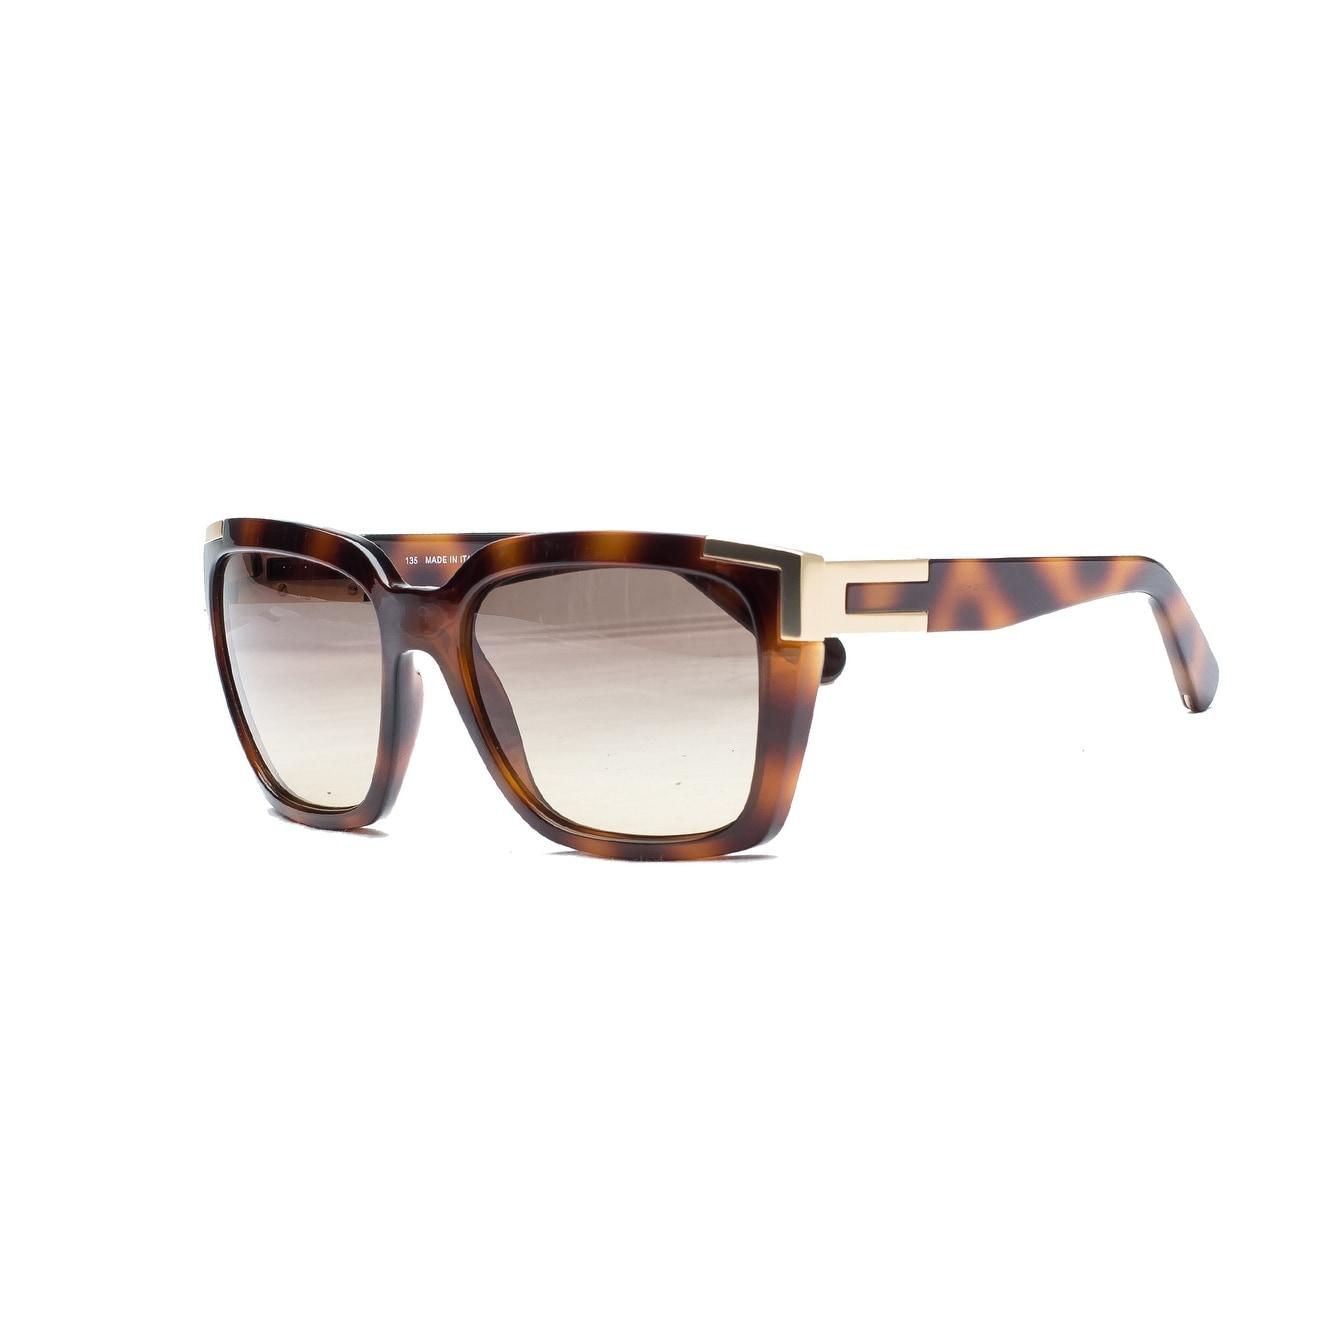 Chloe Women's Alexi Sunglasses Havana - Small - Thumbnail 0